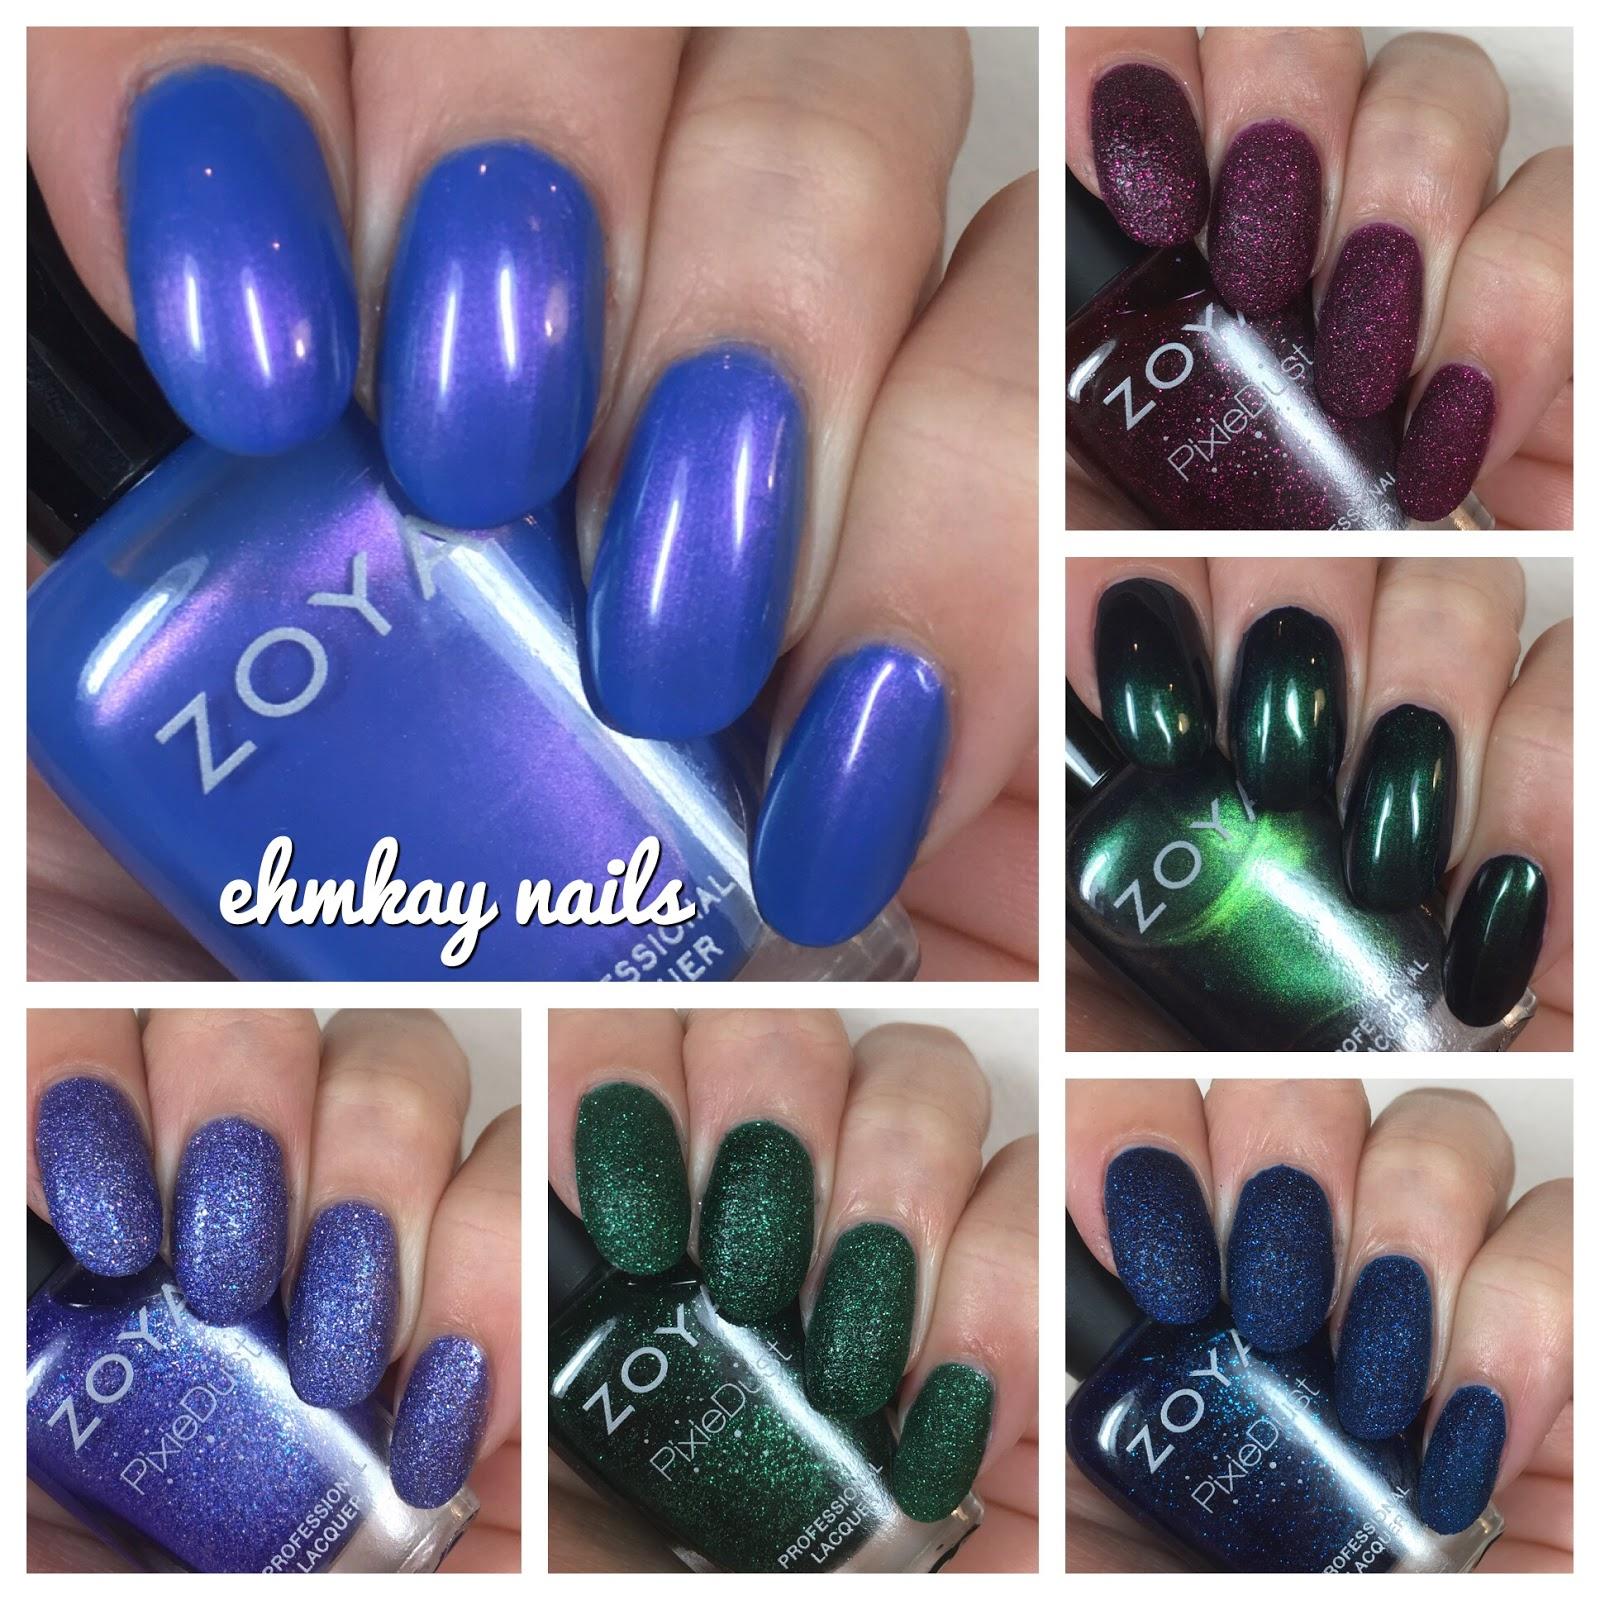 ehmkay nails: Zoya New Year Deal: Get 4 Free Lipsticks or Nail Polishes!